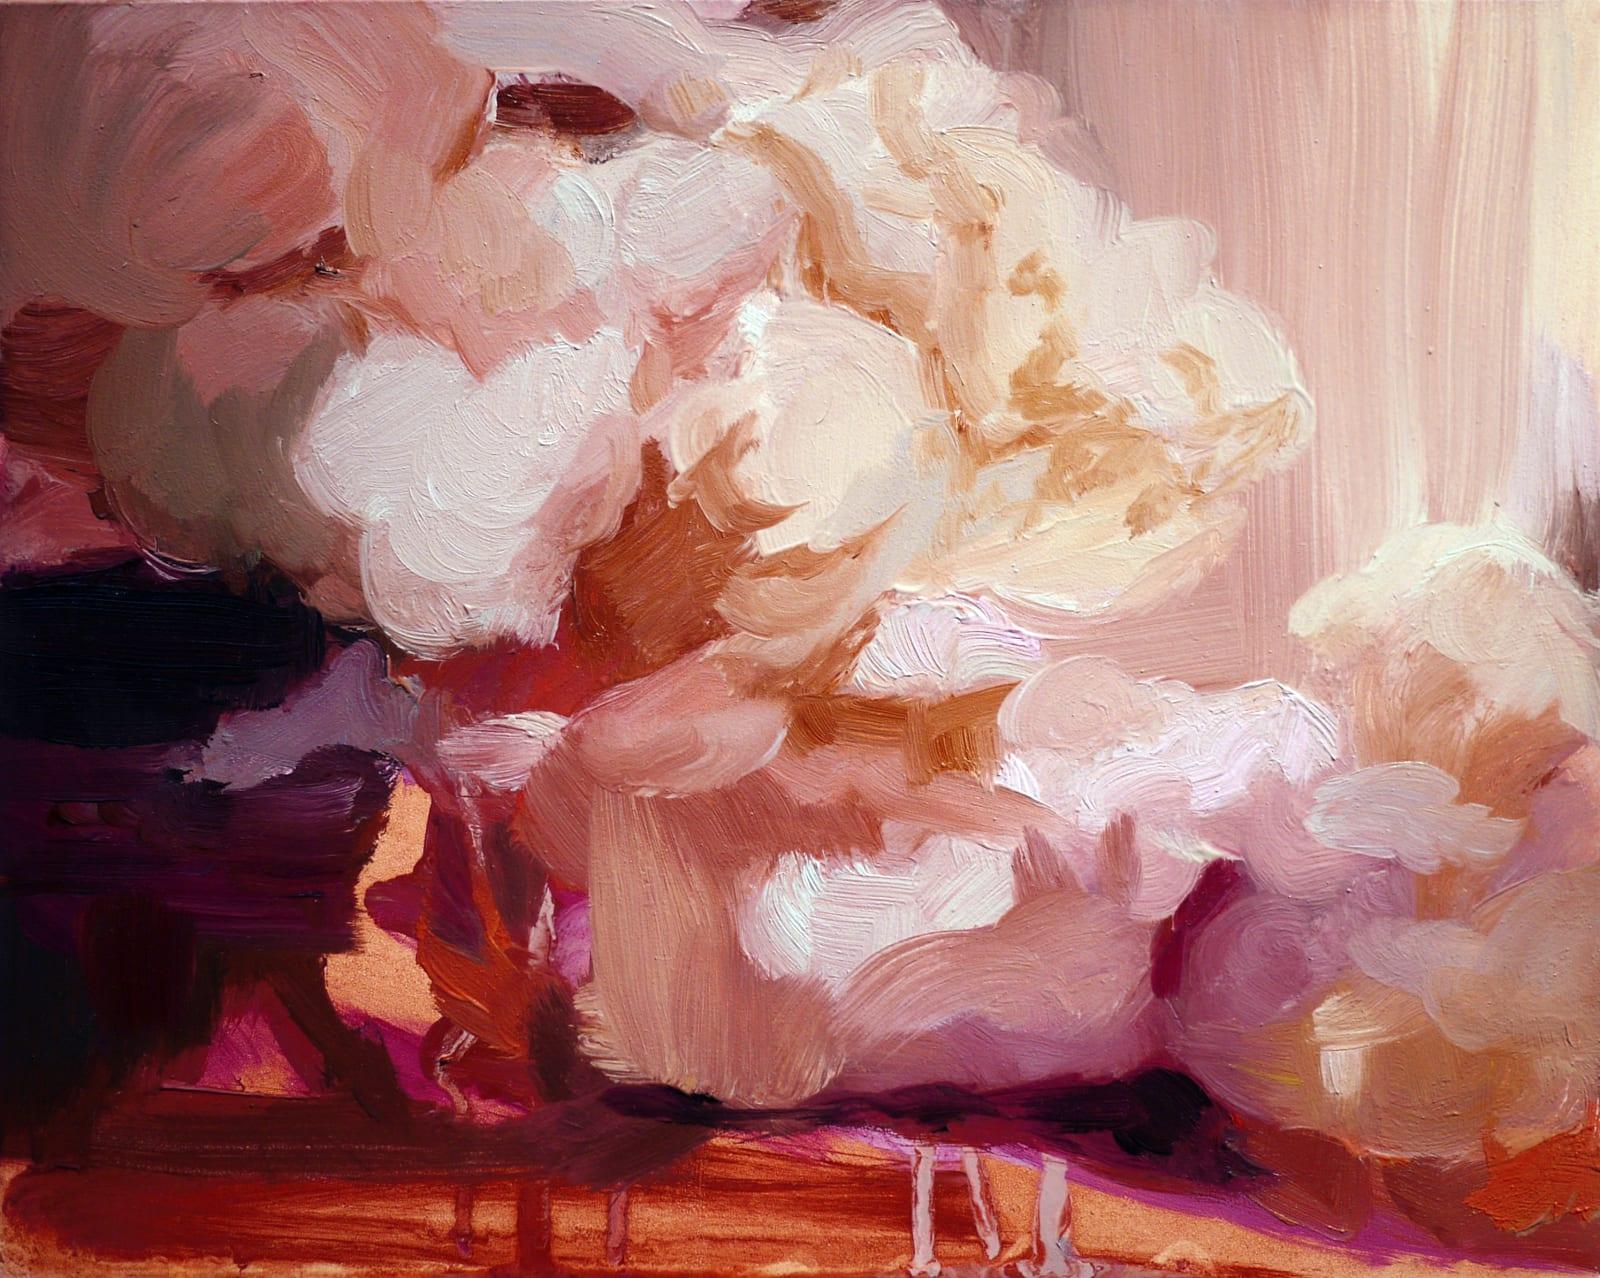 Elizabeth Schwaiger, Smoke Like Pink Cotton, 2015